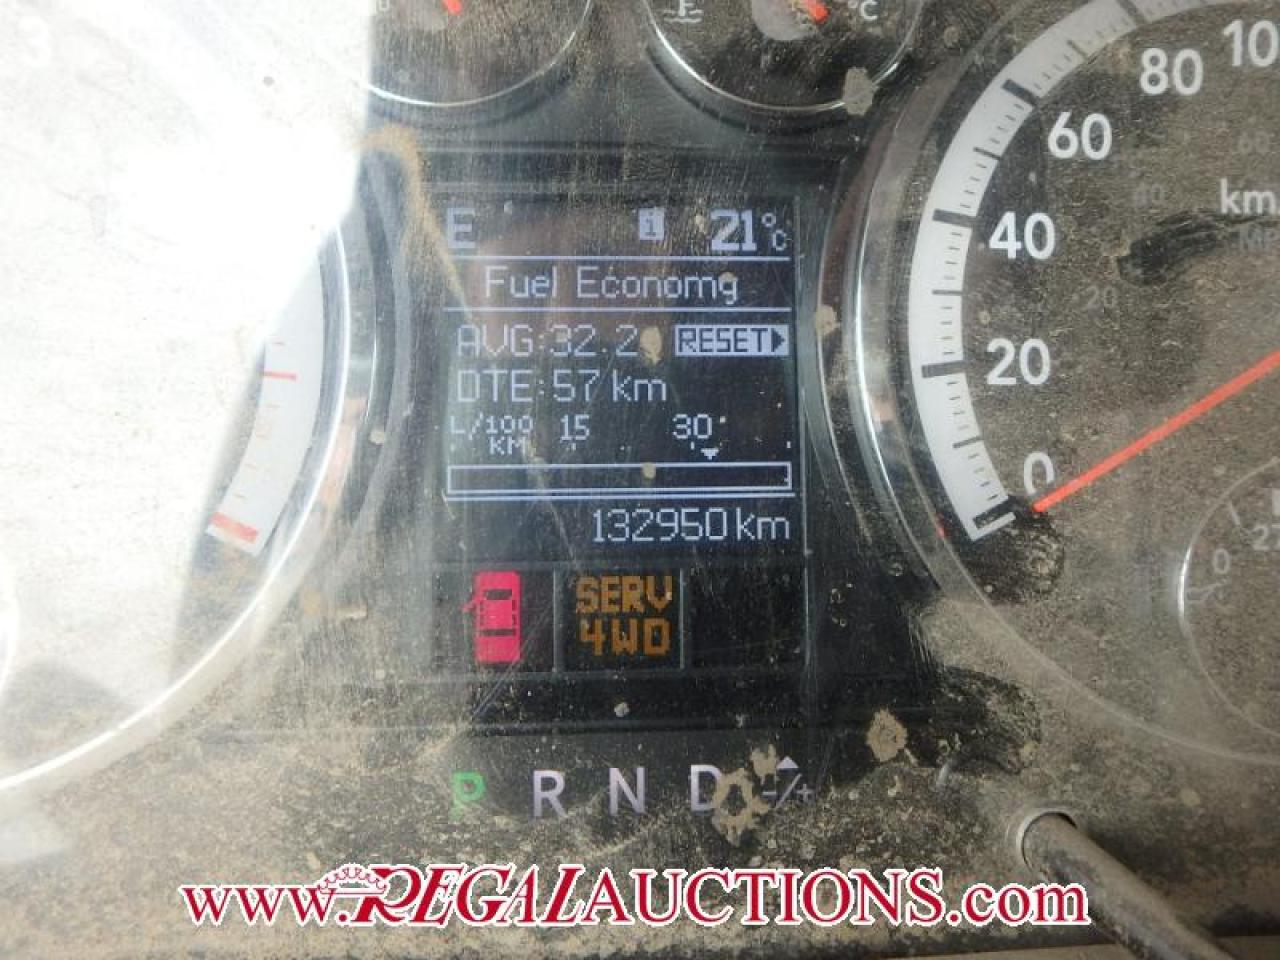 2012 RAM 3500 SLT CREW CAB LWB 4WD 6.7L